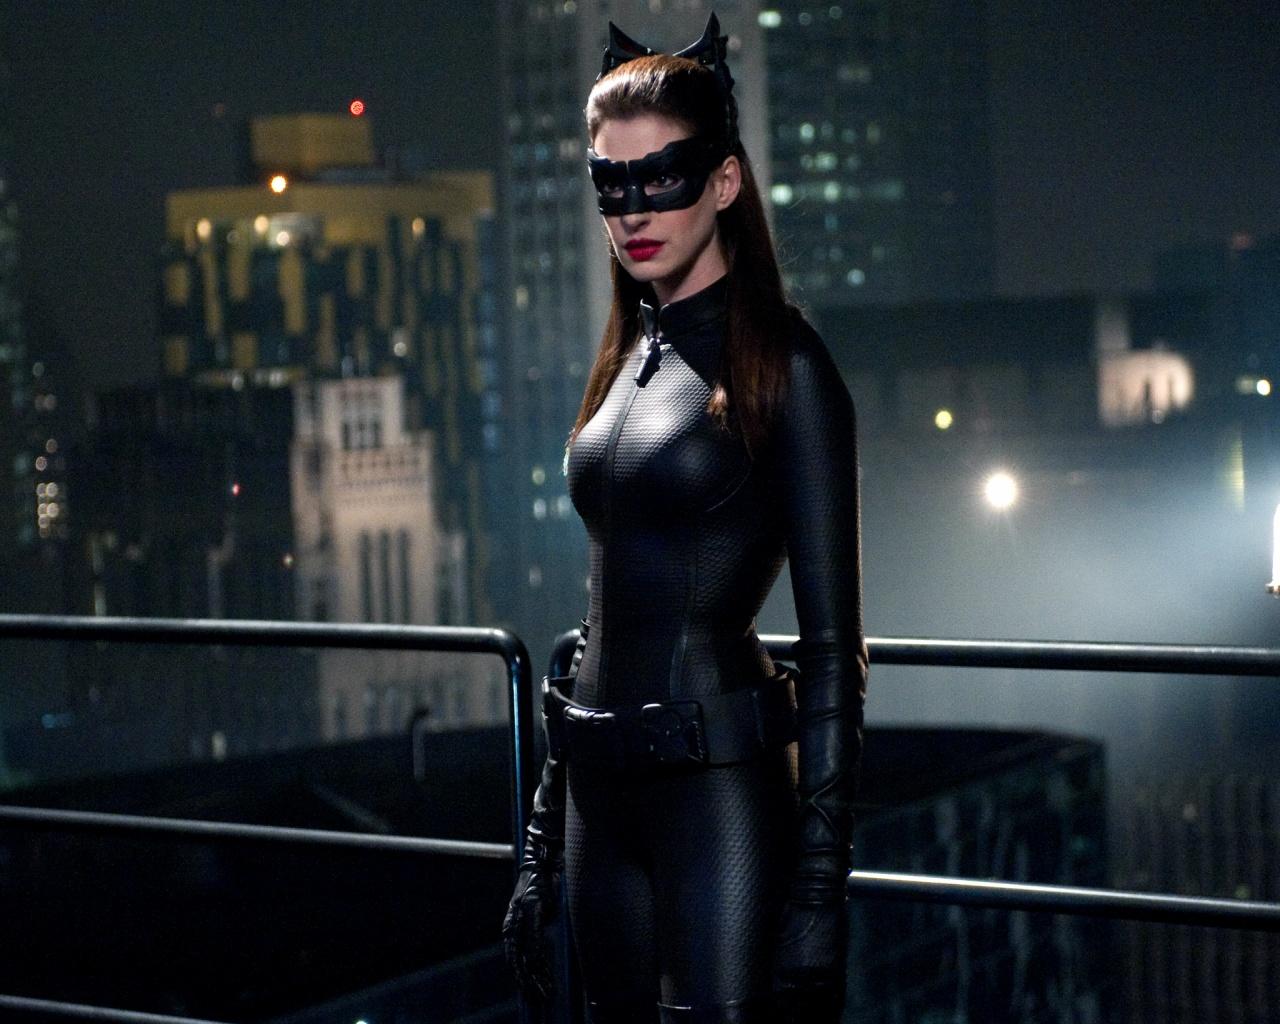 http://4.bp.blogspot.com/-eKn-pcKQIak/UAuzAKic9eI/AAAAAAAAALc/T5ra6wo3xbI/s1600/anne_hathaway_catwoman_dark_knight_rises.jpg